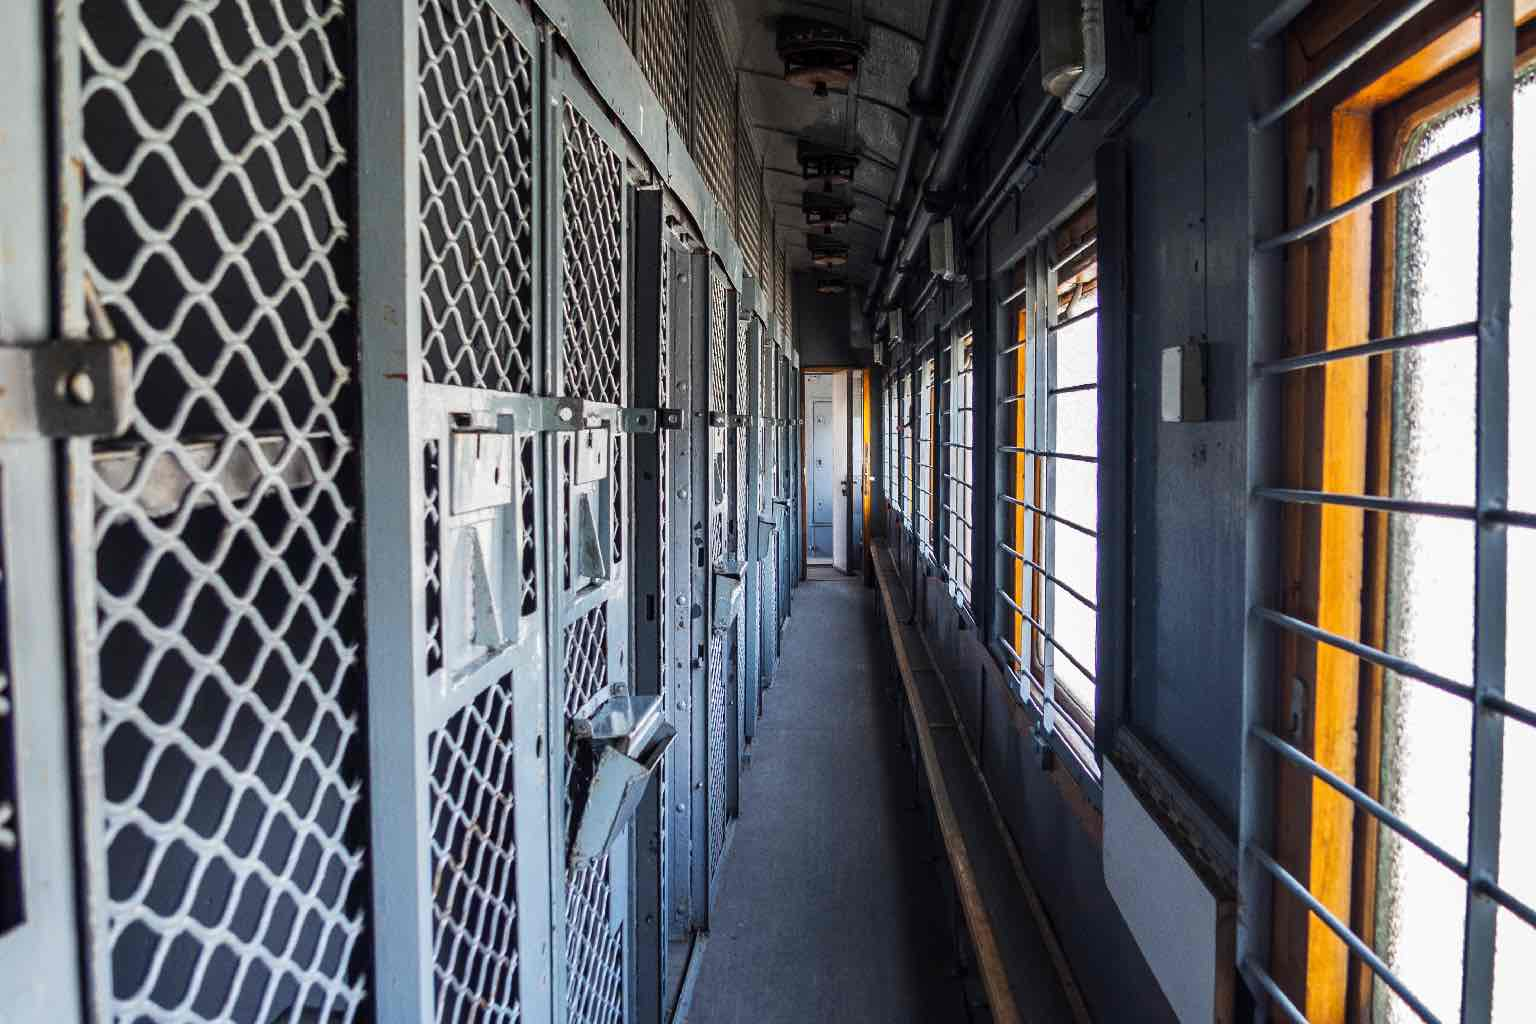 Prison transport